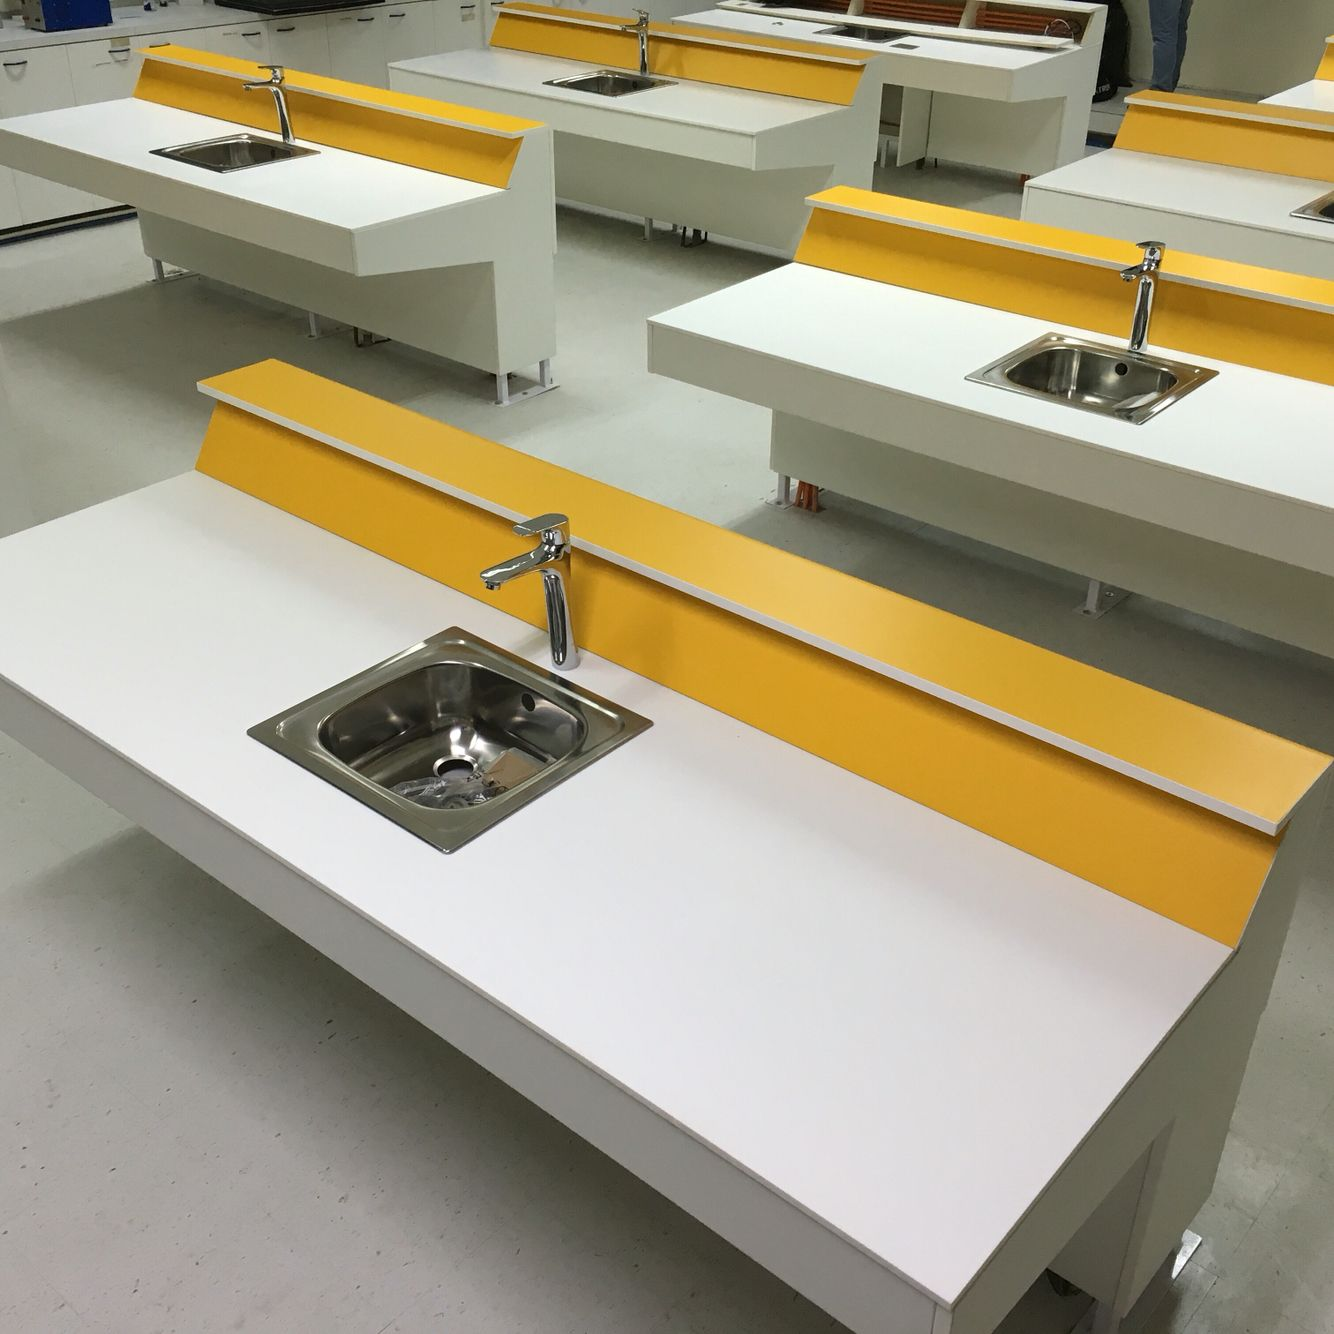 Mesones Para Laboratorio De Quimica Troika Diseno Design